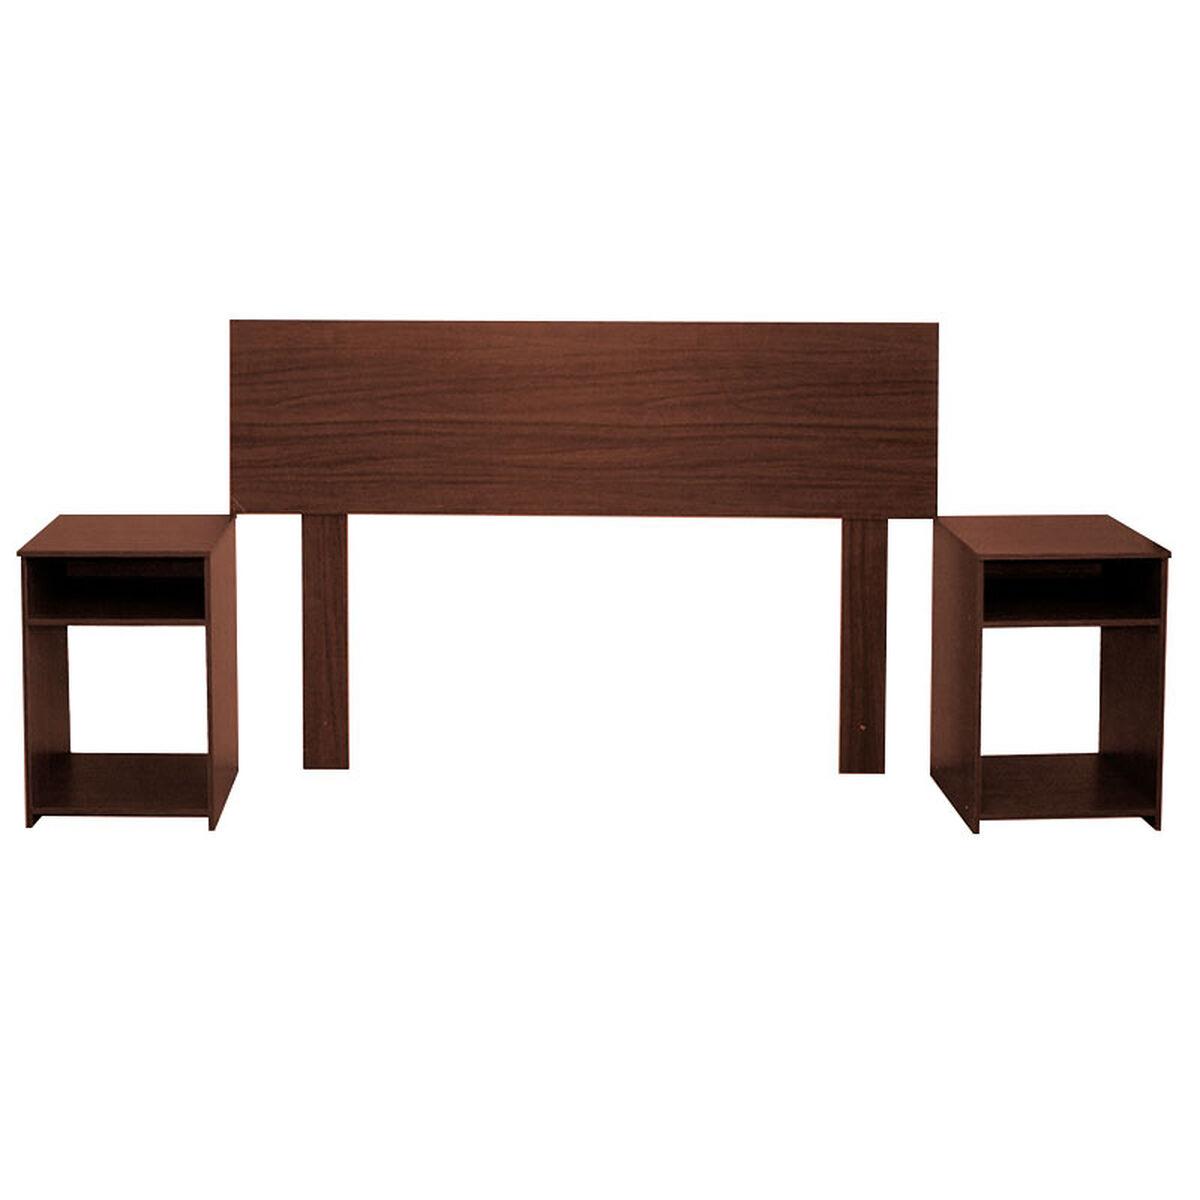 Combo Box Americano CIC 2 Plazas Excellence + Set Maderas Casanova Nogal + Pack Almohadas Celta Imperial Soft